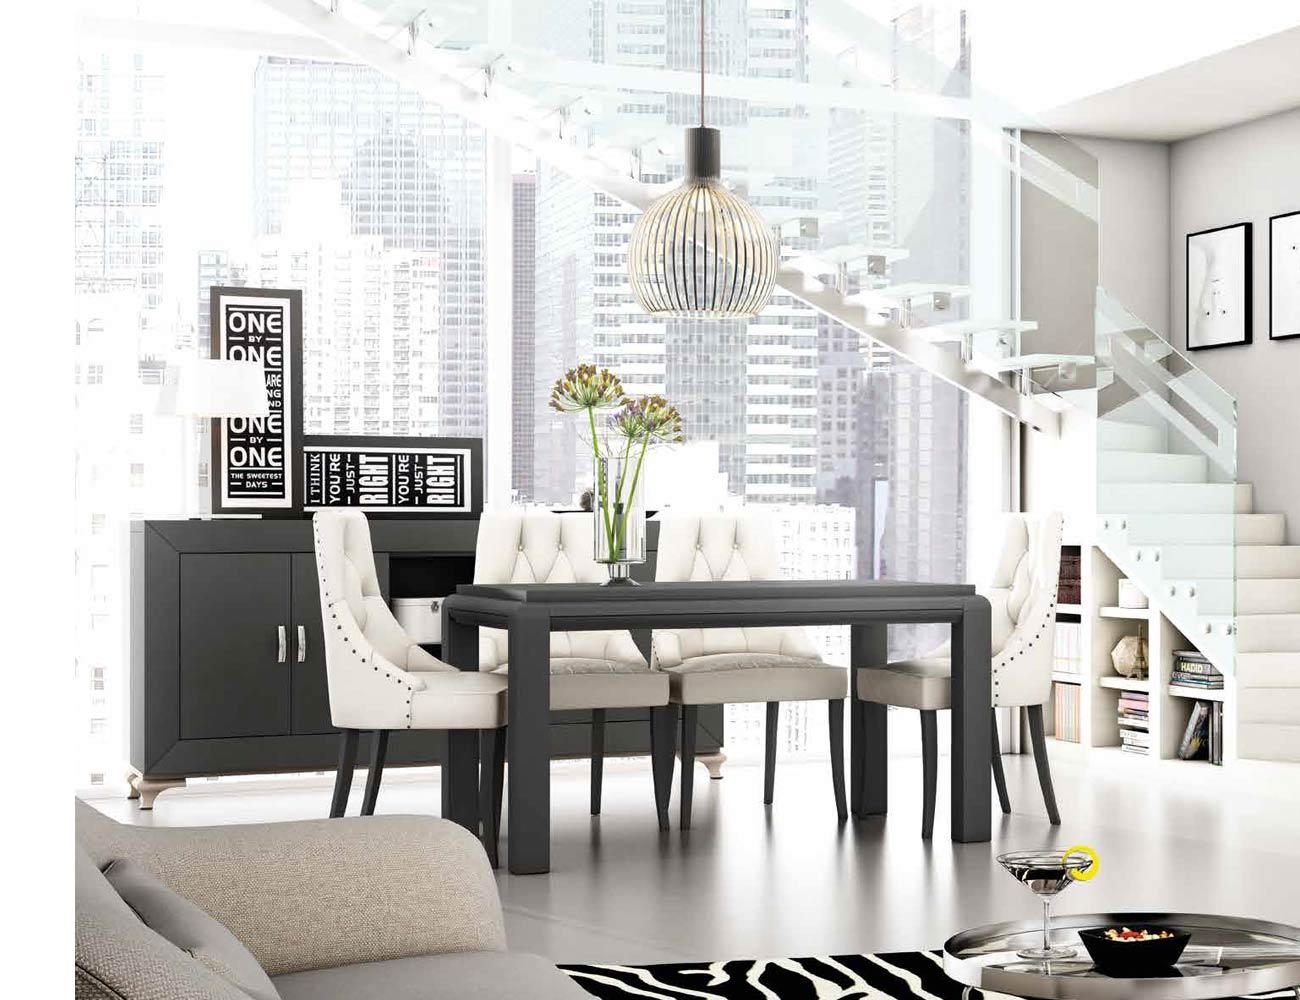 Mesa sillas composicion 06